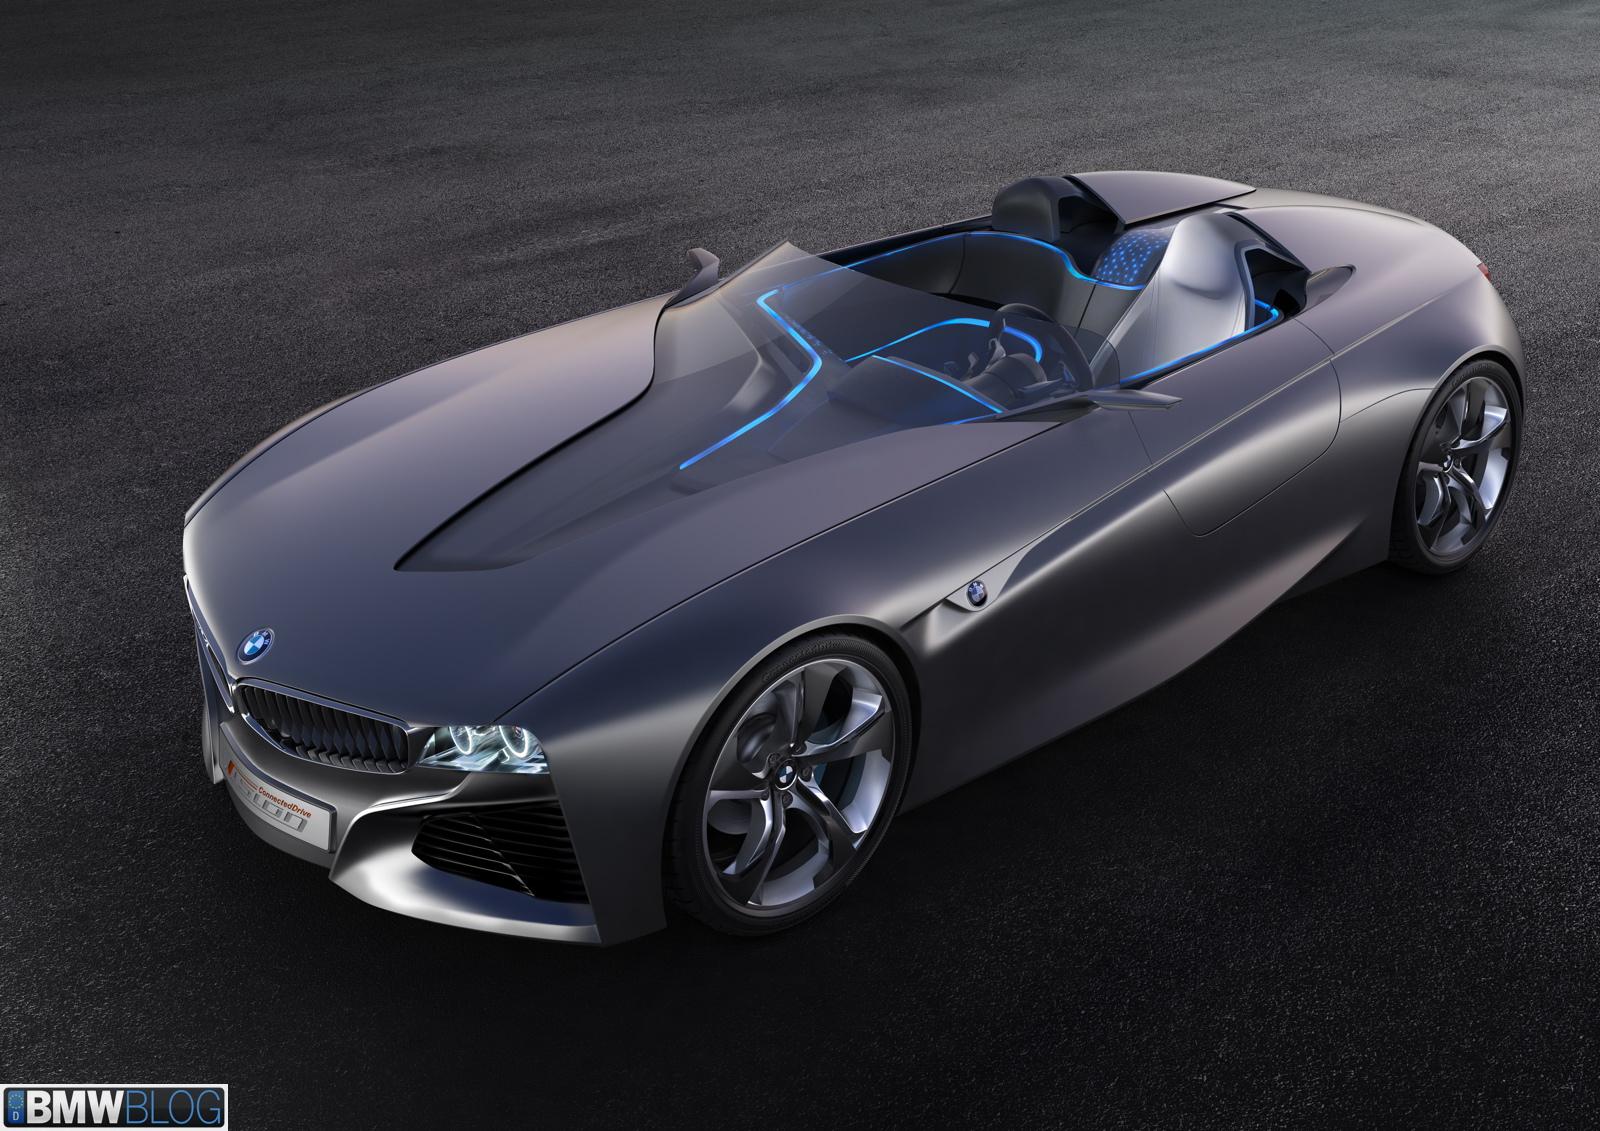 Bmw Concept Cars 18 655x463